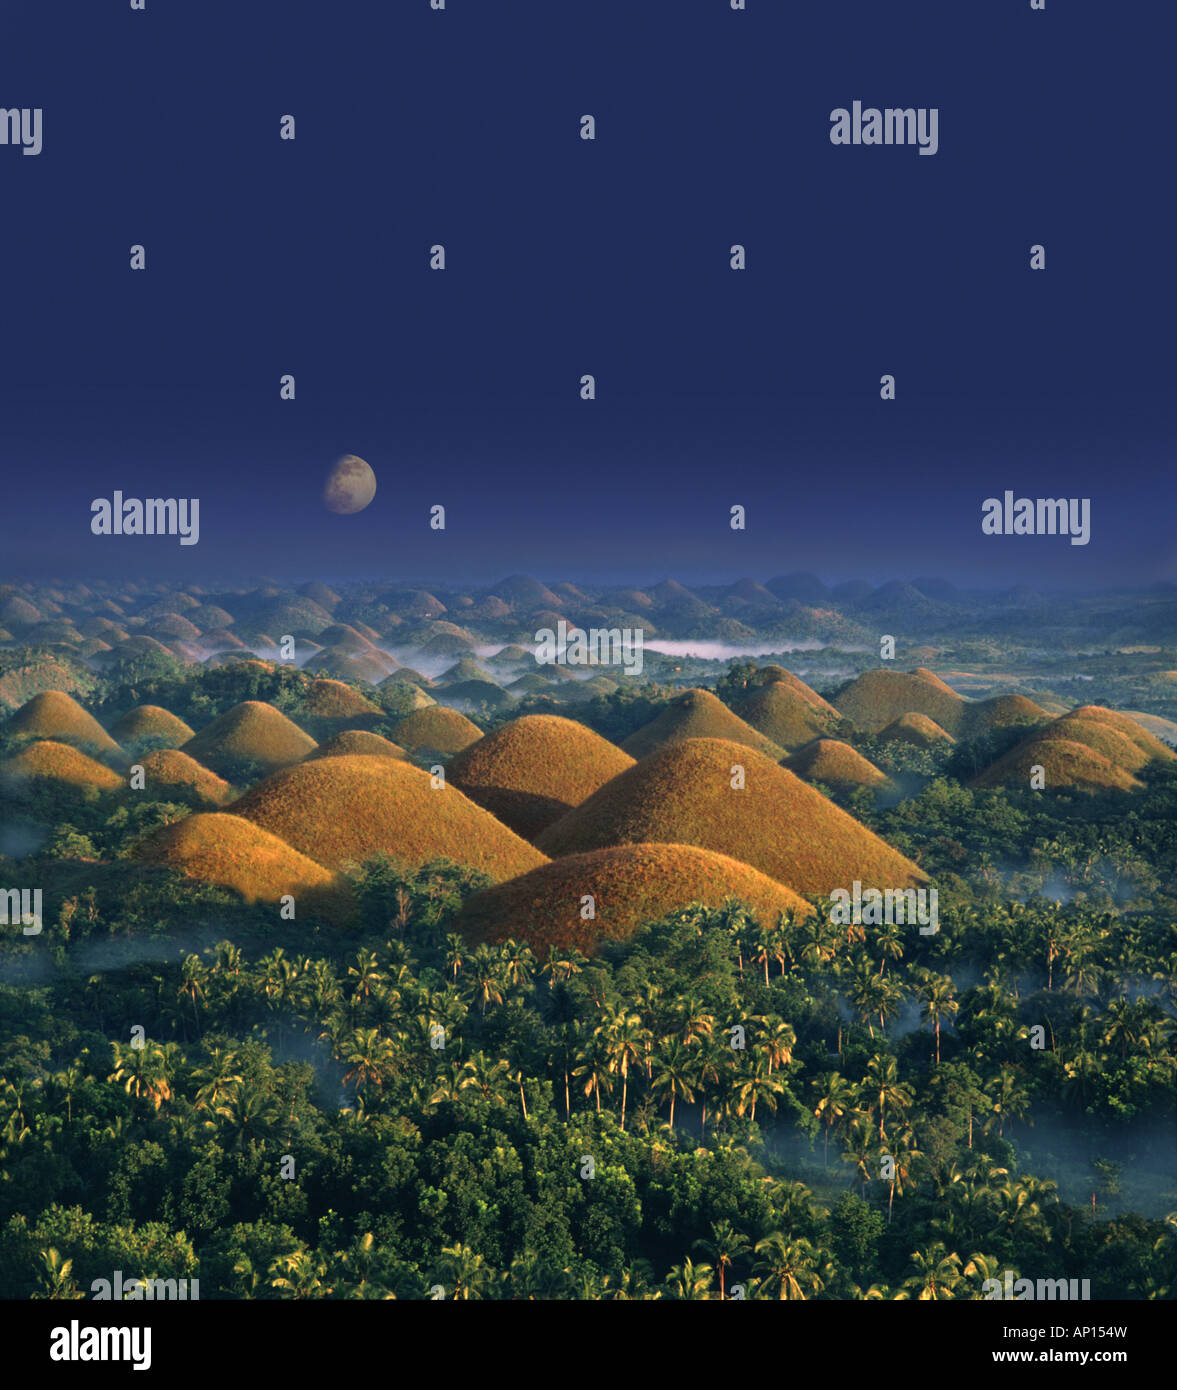 Moonrise, Chocolate Hills, natural wonder, Bohol Island, Philippines - Stock Image